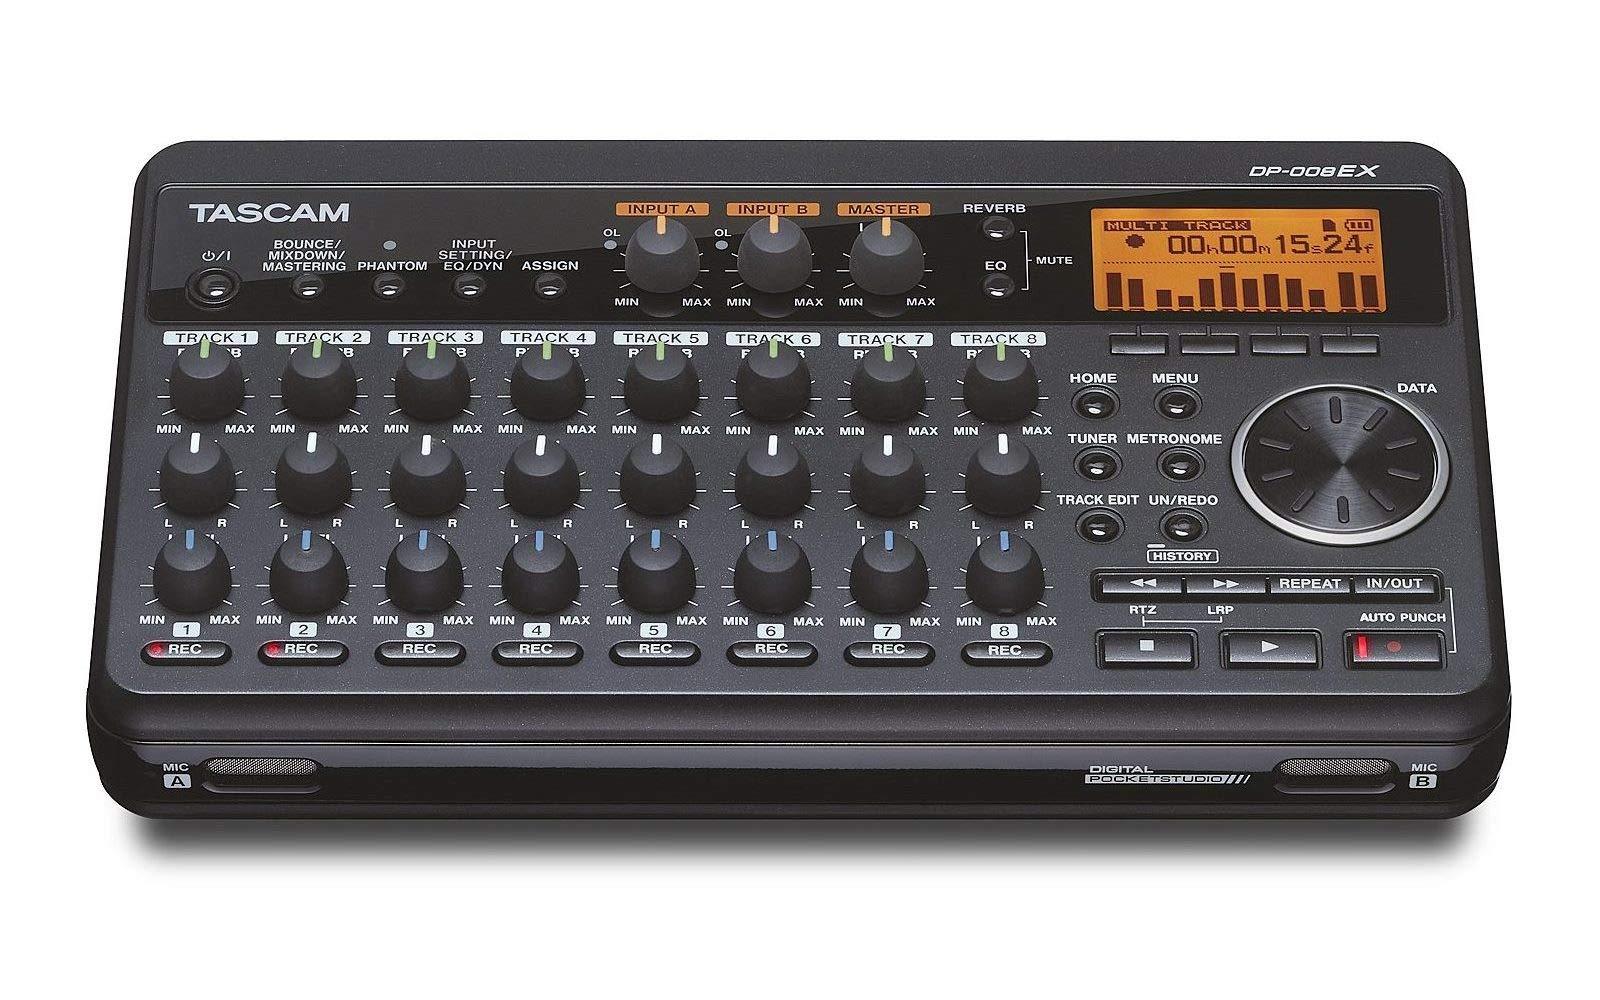 Tascam DP-008EX 8-Track Digital Pocketstudio Multi-Track Audio Recorder